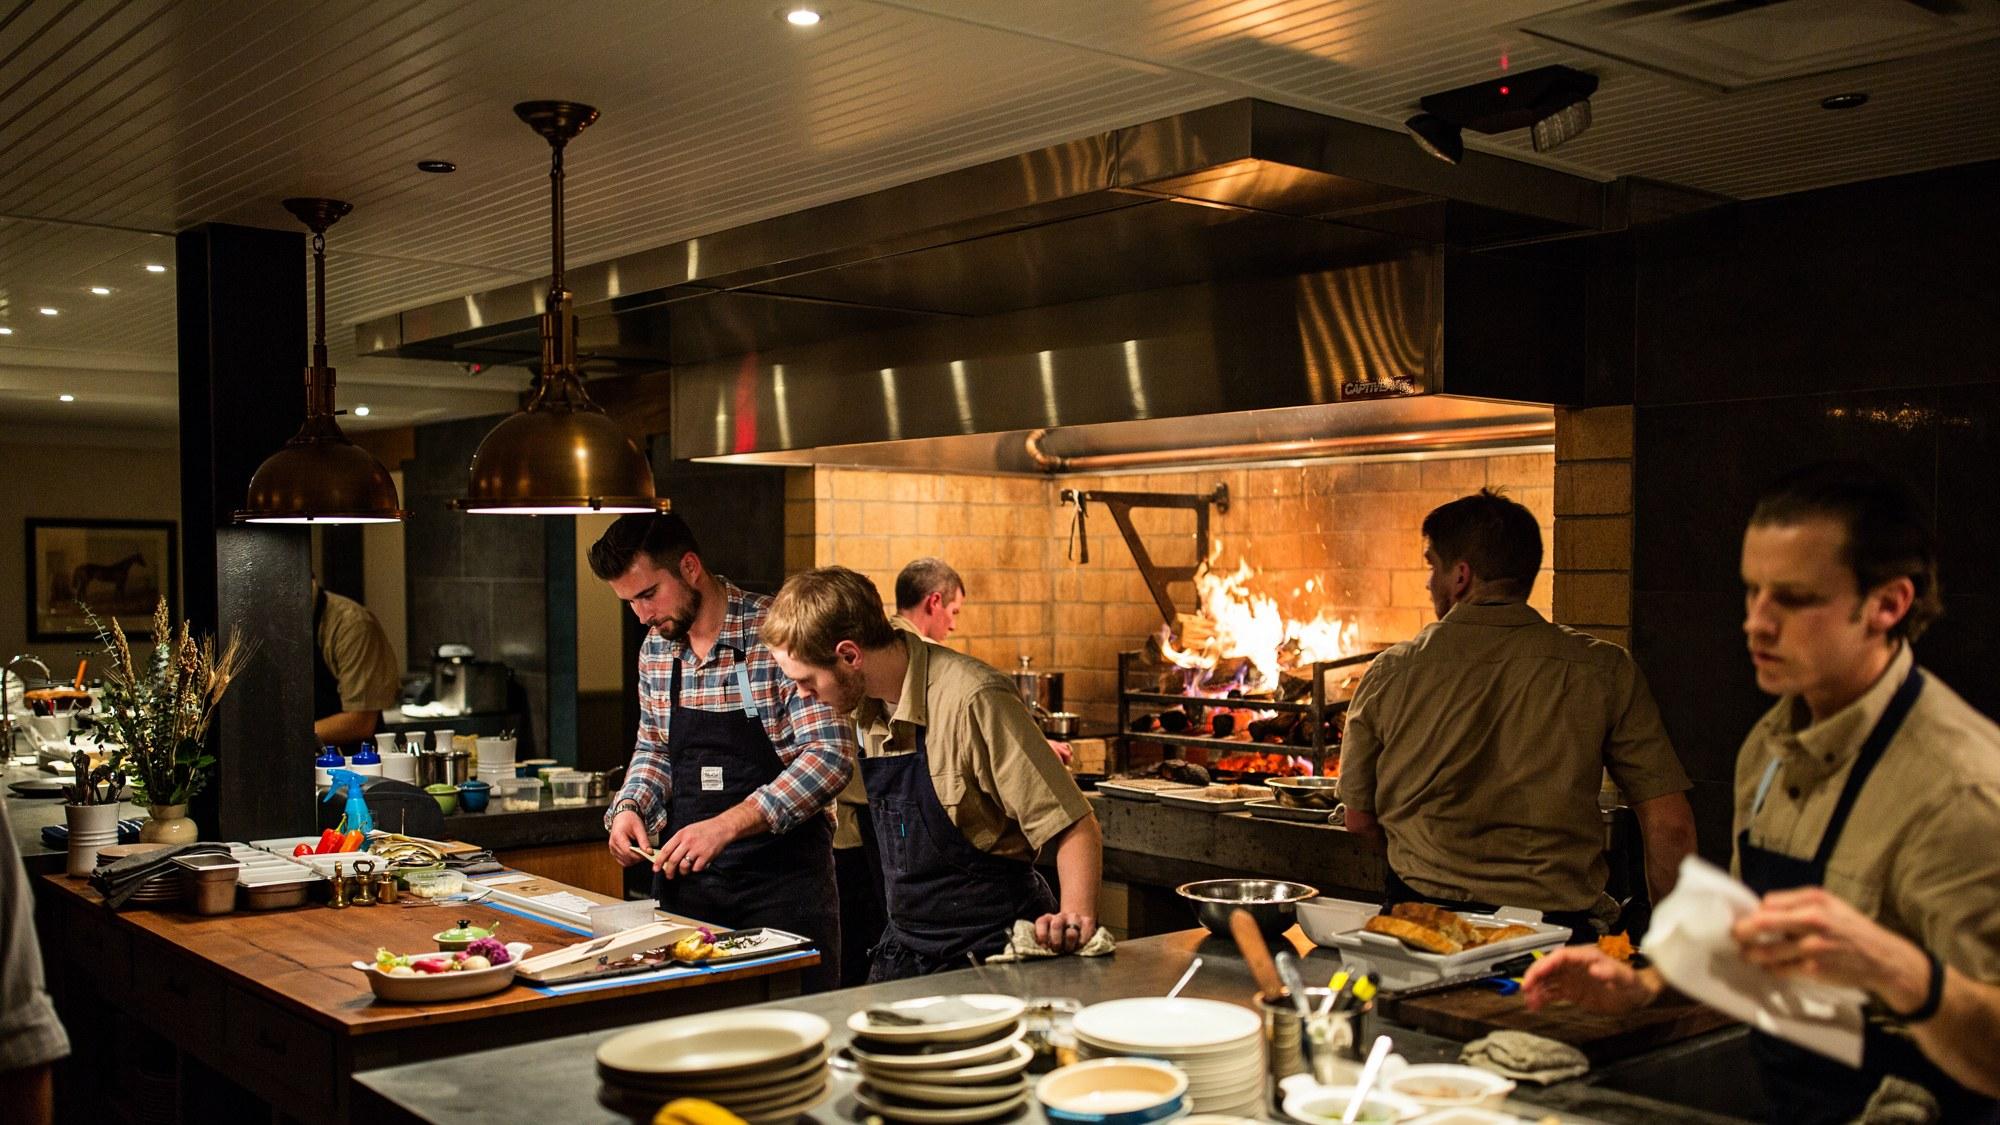 Washington D.C. Is the Restaurant City of the Year - Bon Appetit (8/10/16)